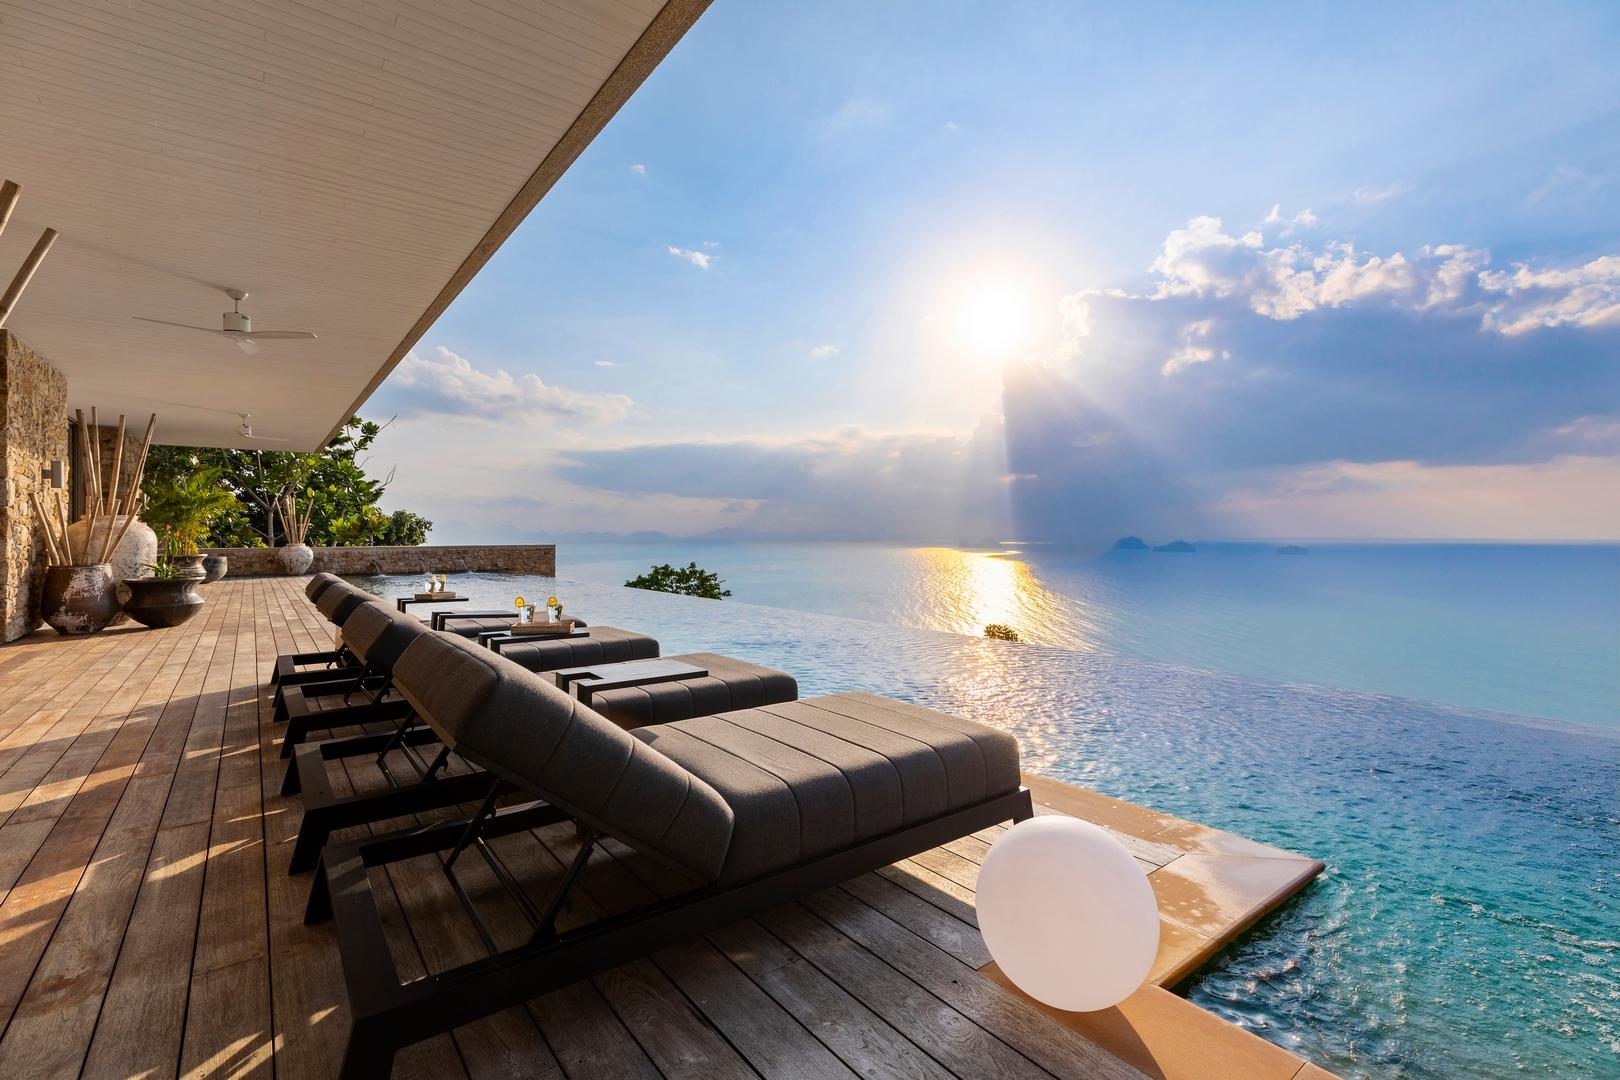 4 bedroom sea view villa close to the water